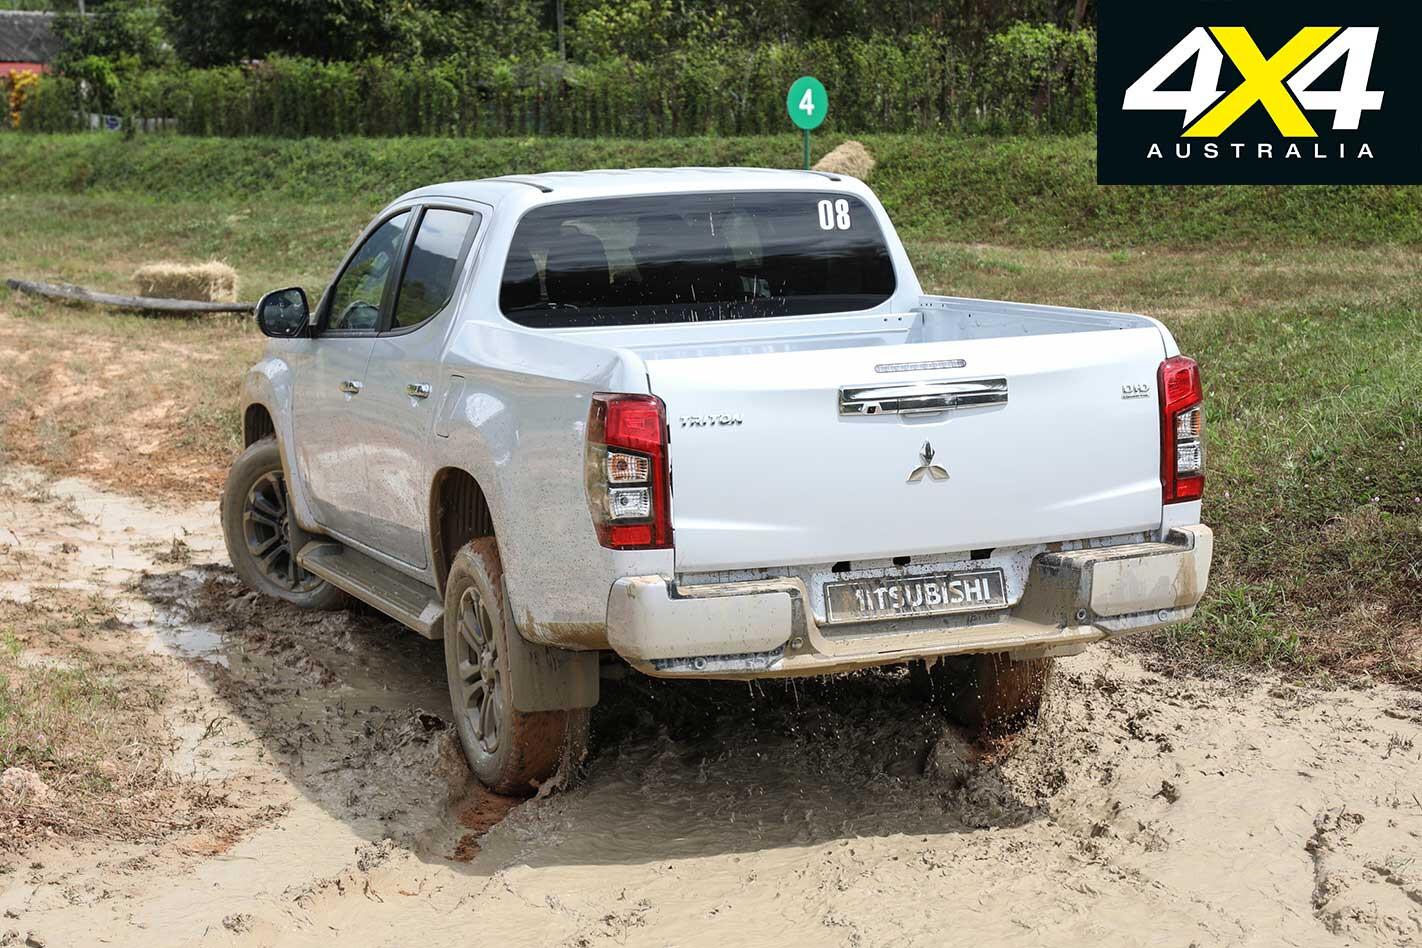 2019 Mitsubishi Triton Rear Muddy Tracks Jpg